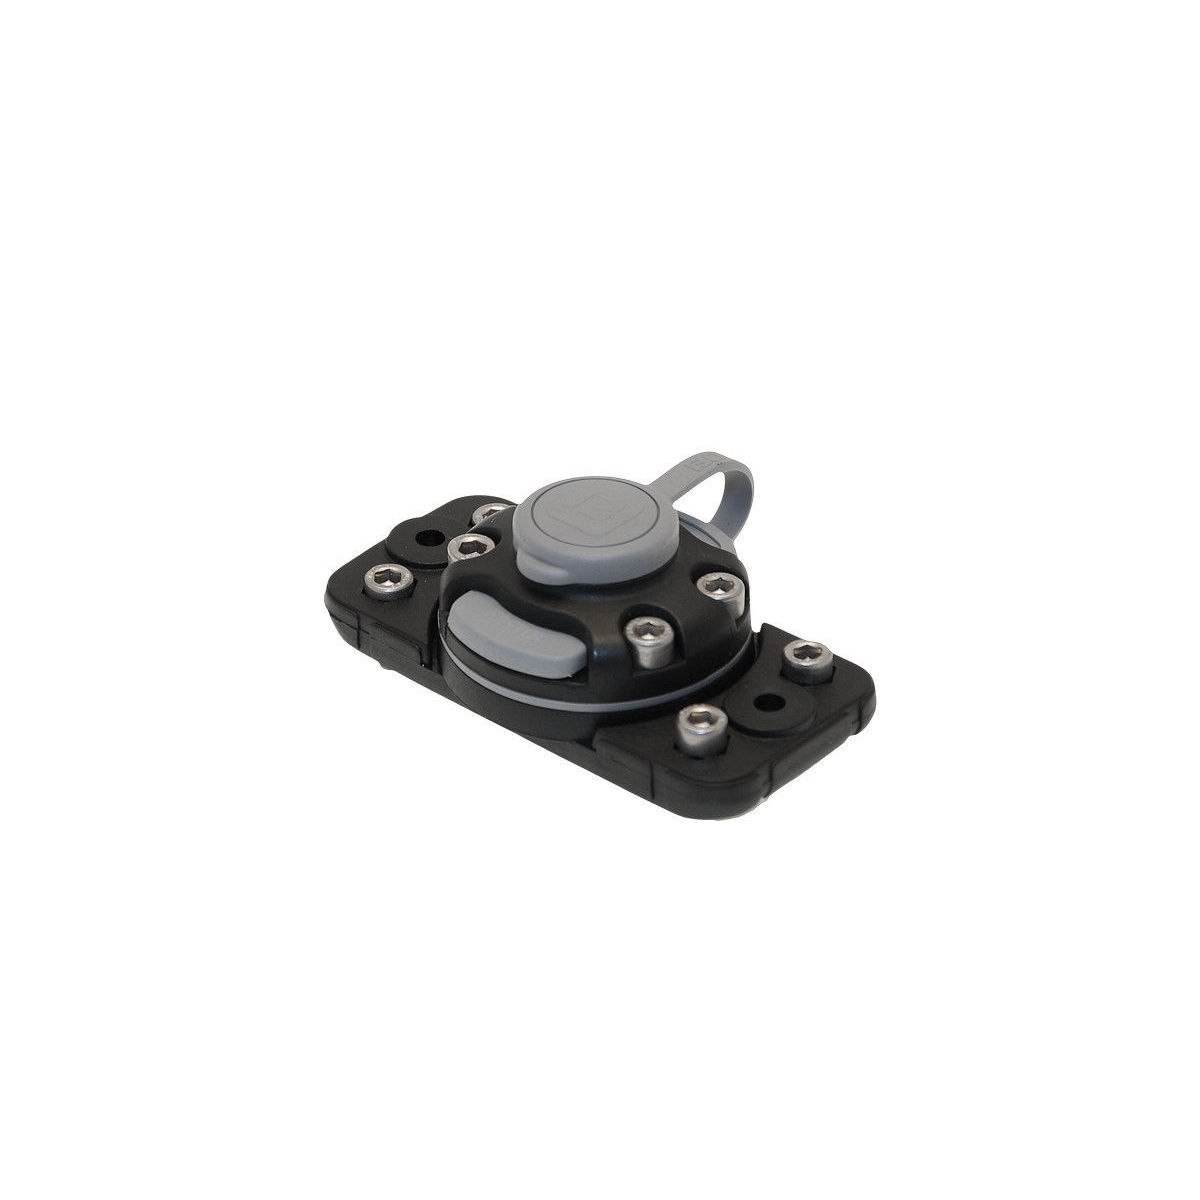 Adapter For Hard Board Reinforced With Mount, Black, Borika FFr444_black